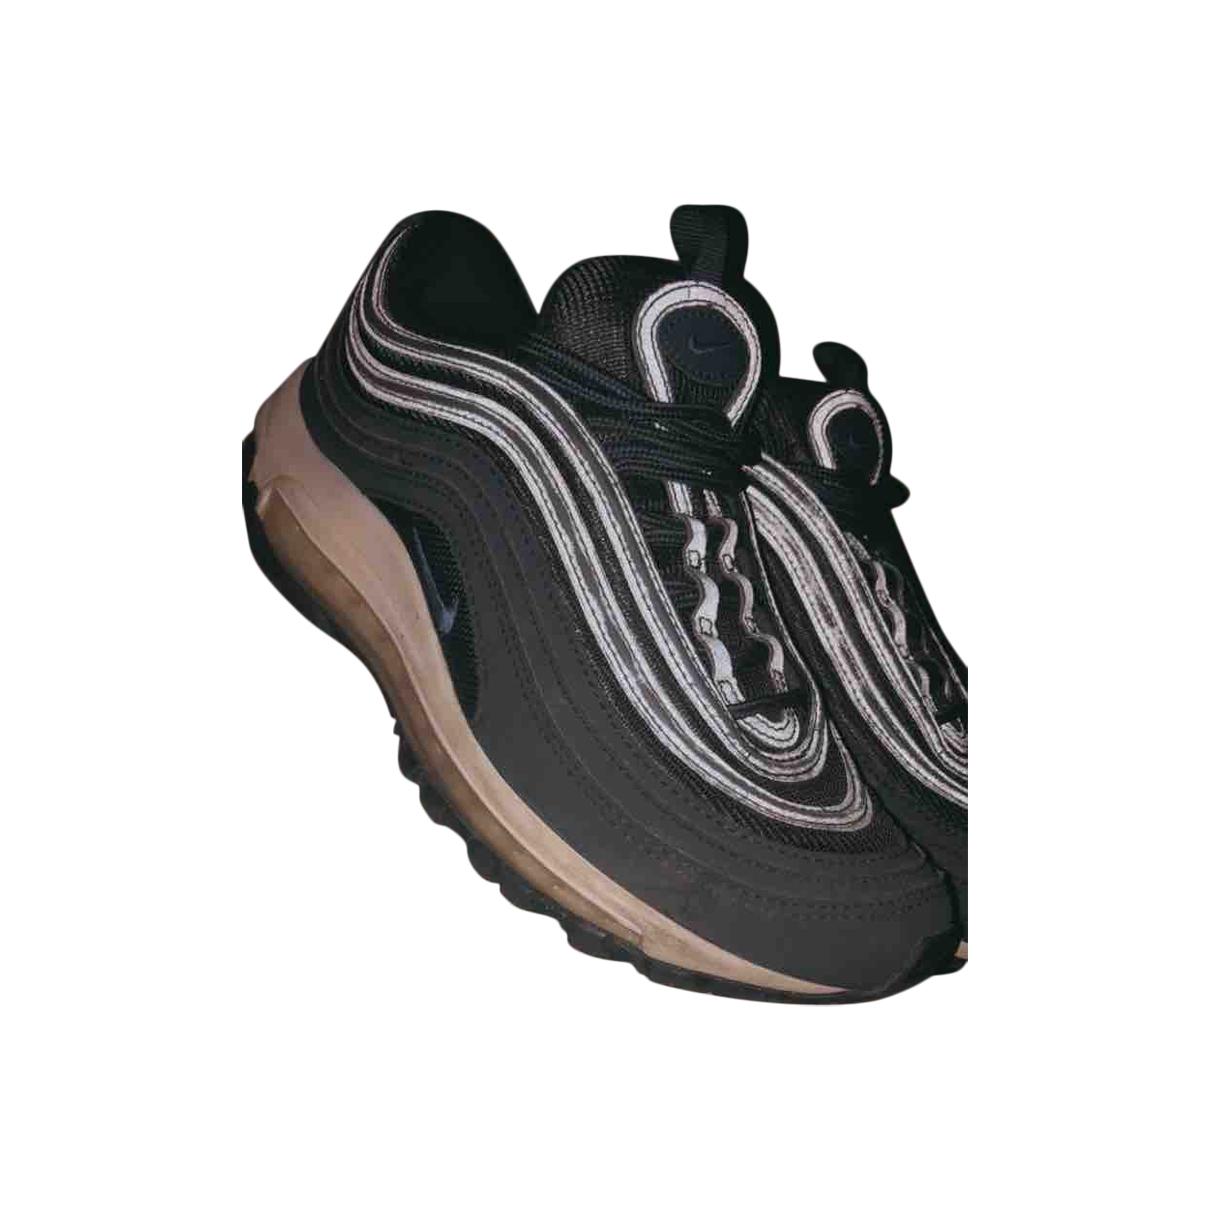 Nike Air Max 97 Sneakers in Kautschuk